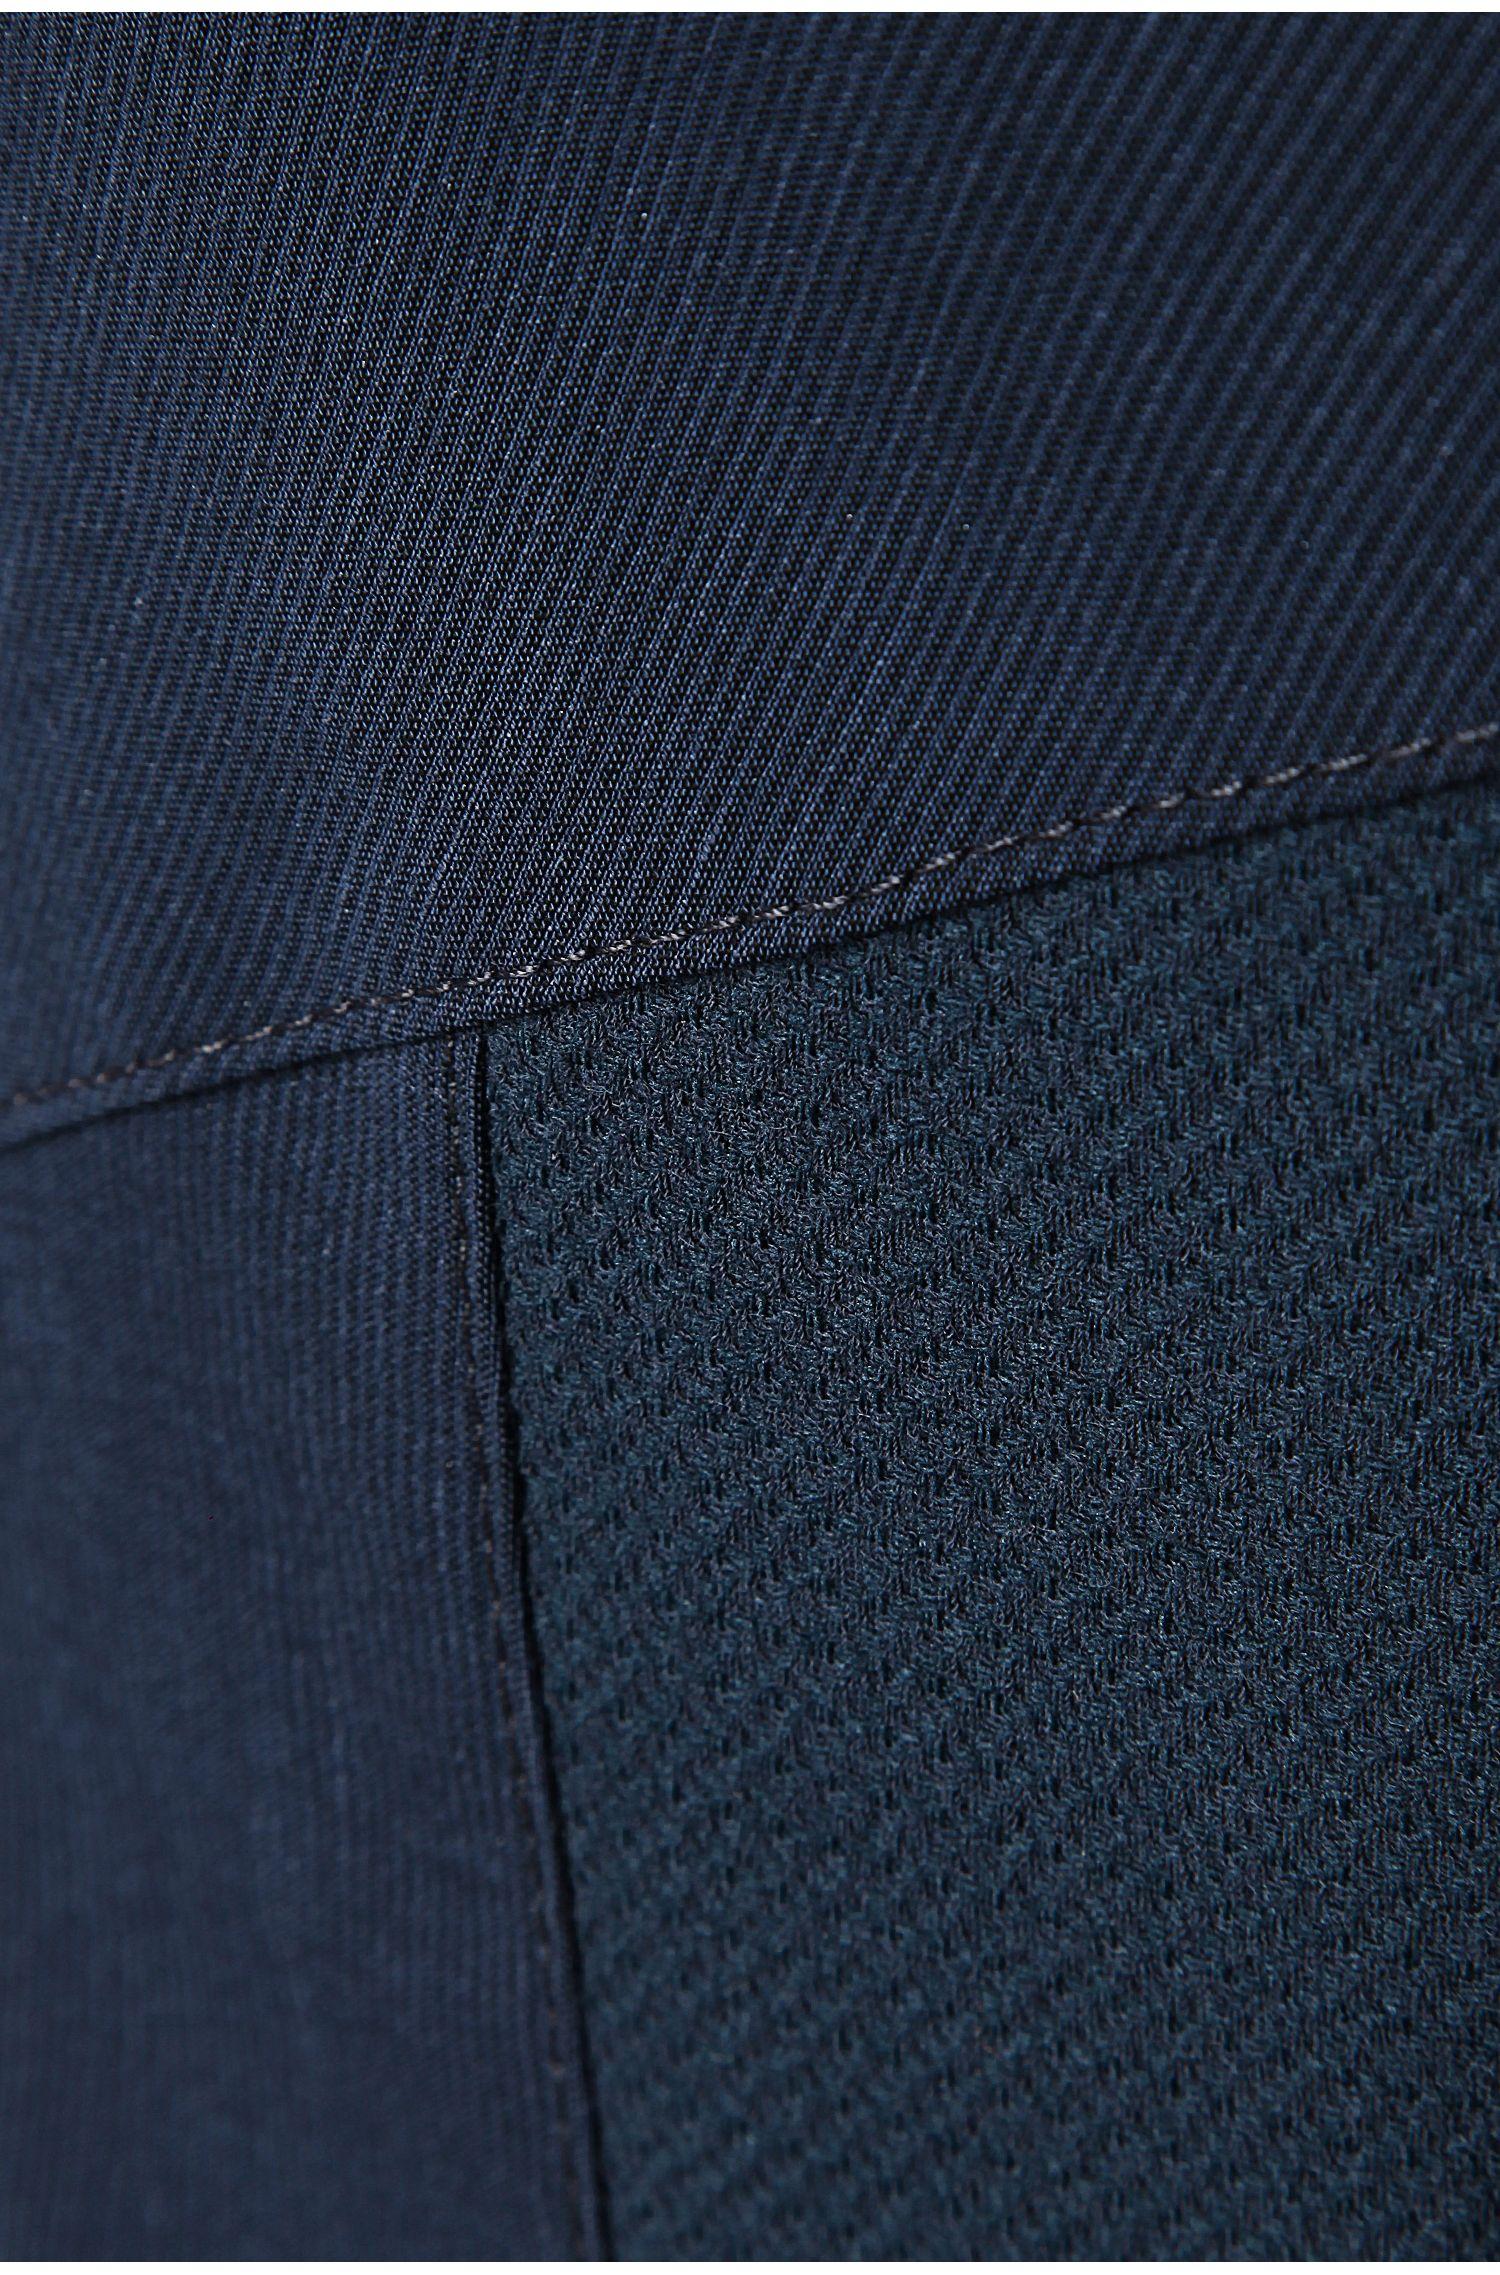 Robe sans manches en viscose mélangée, avec du lin: «Ariga»